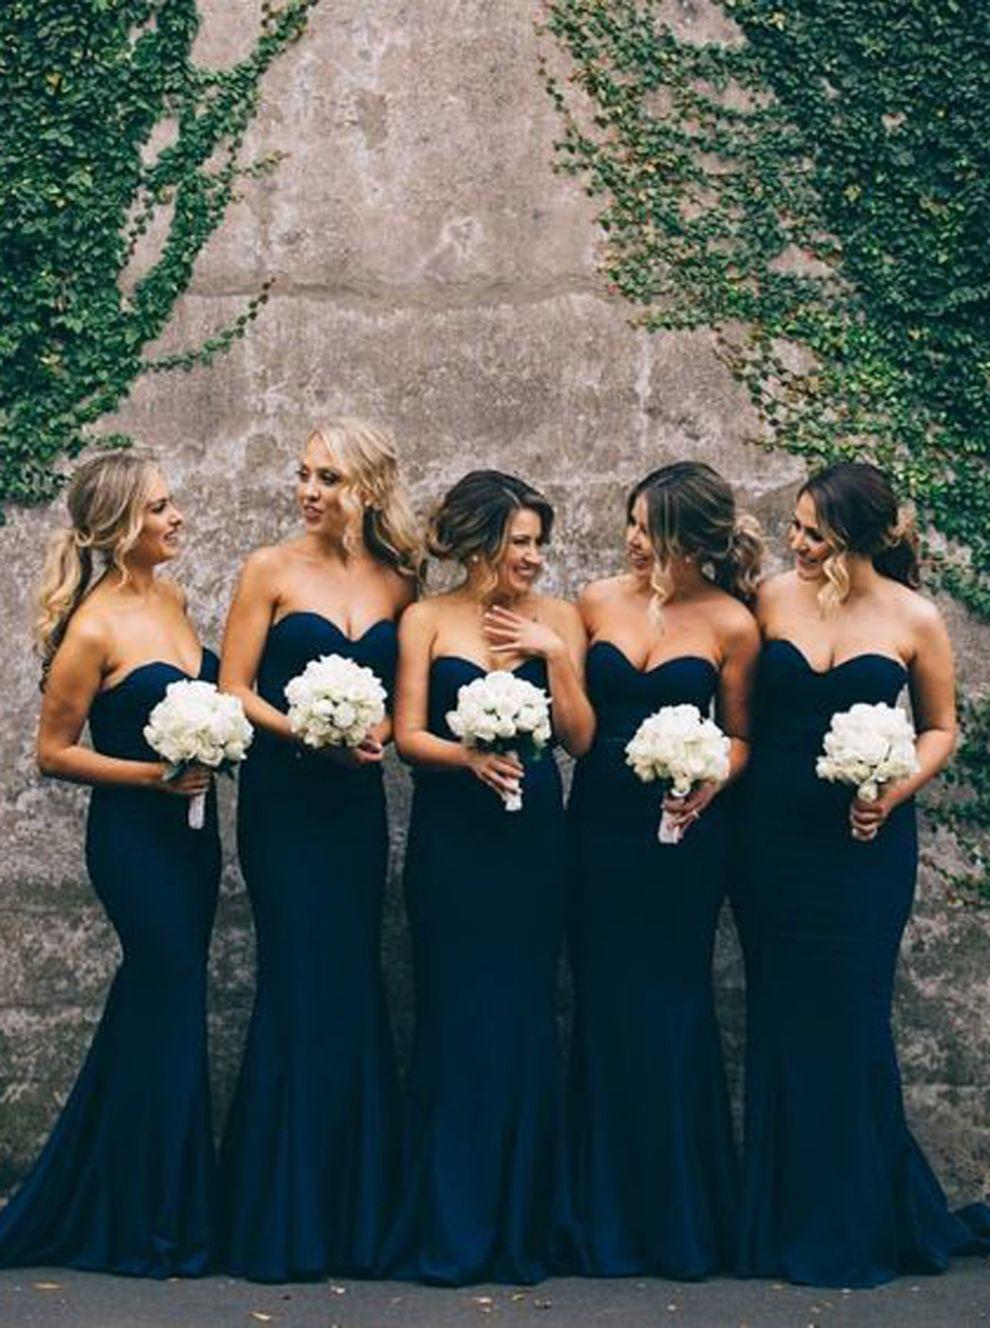 Blue dress navy blue dress mermaid dress bridesmaid dress navy gorgeous mermaid long navy blue strapless bridesmaid dress from modsele ombrellifo Gallery